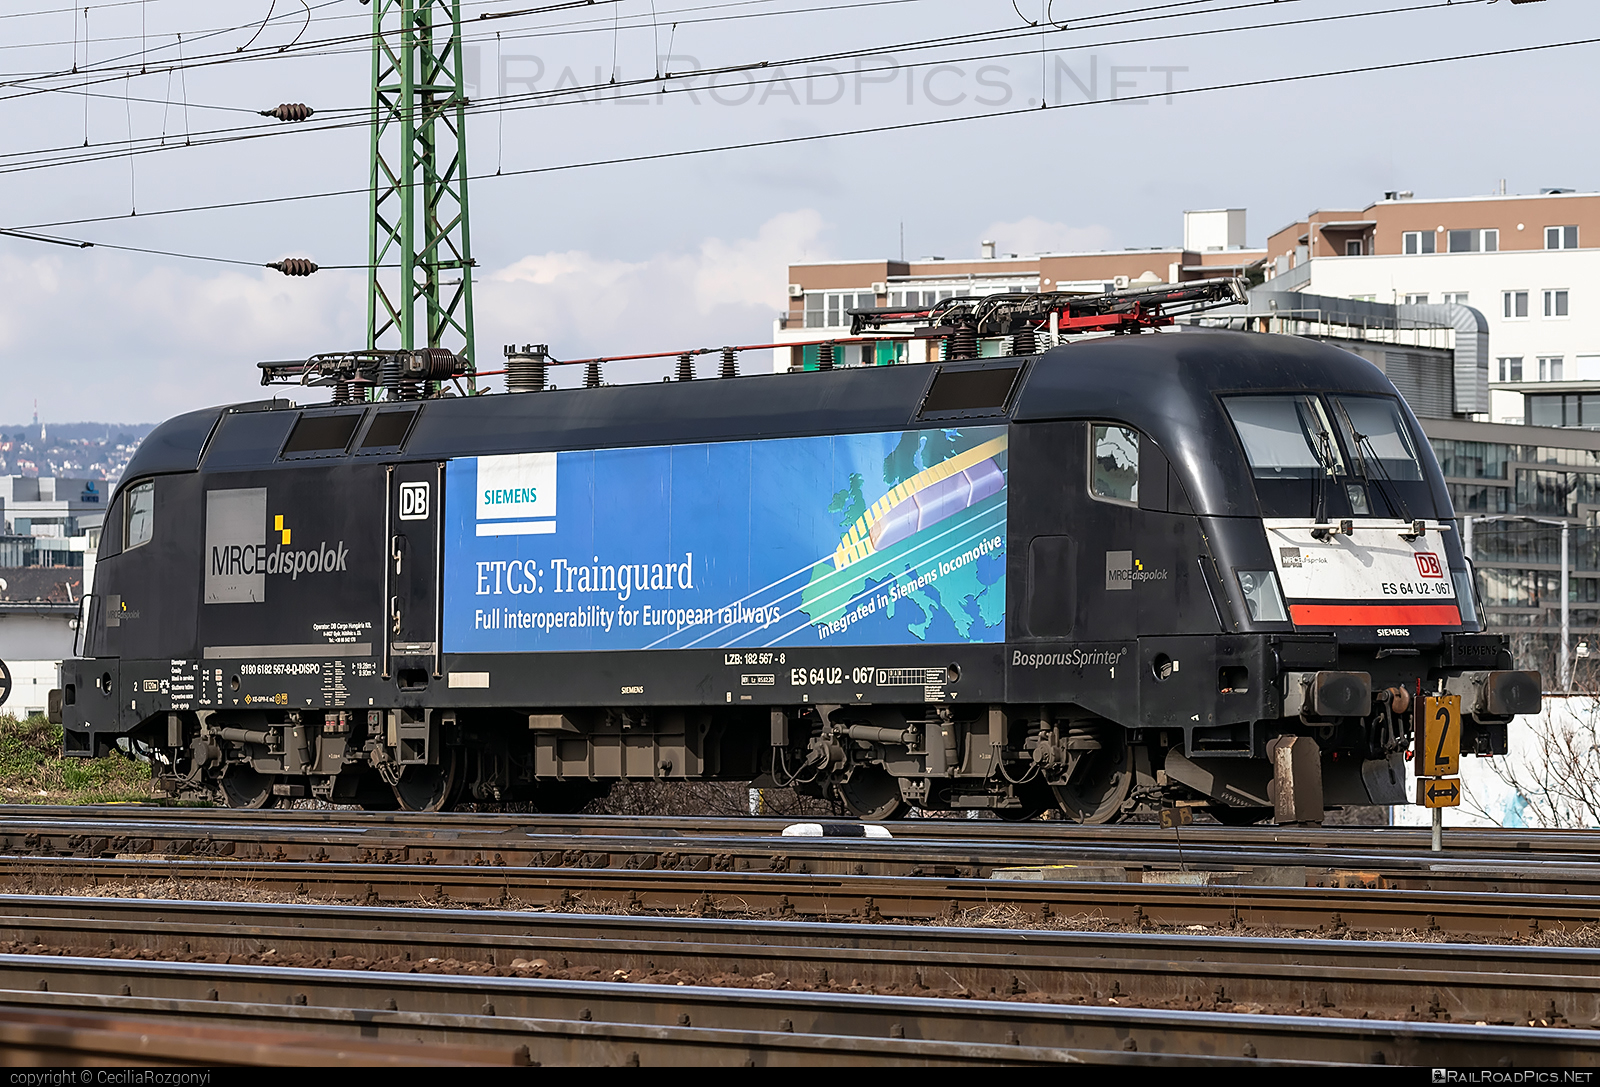 Siemens ES 64 U2 - 182 567-8 operated by DB Cargo Hungária Kft #db #dbcargo #dbcargohungaria #dispolok #es64 #es64u #es64u2 #eurosprinter #mitsuirailcapitaleurope #mitsuirailcapitaleuropegmbh #mrce #siemens #siemenses64 #siemenses64u #siemenses64u2 #siemenstaurus #taurus #tauruslocomotive